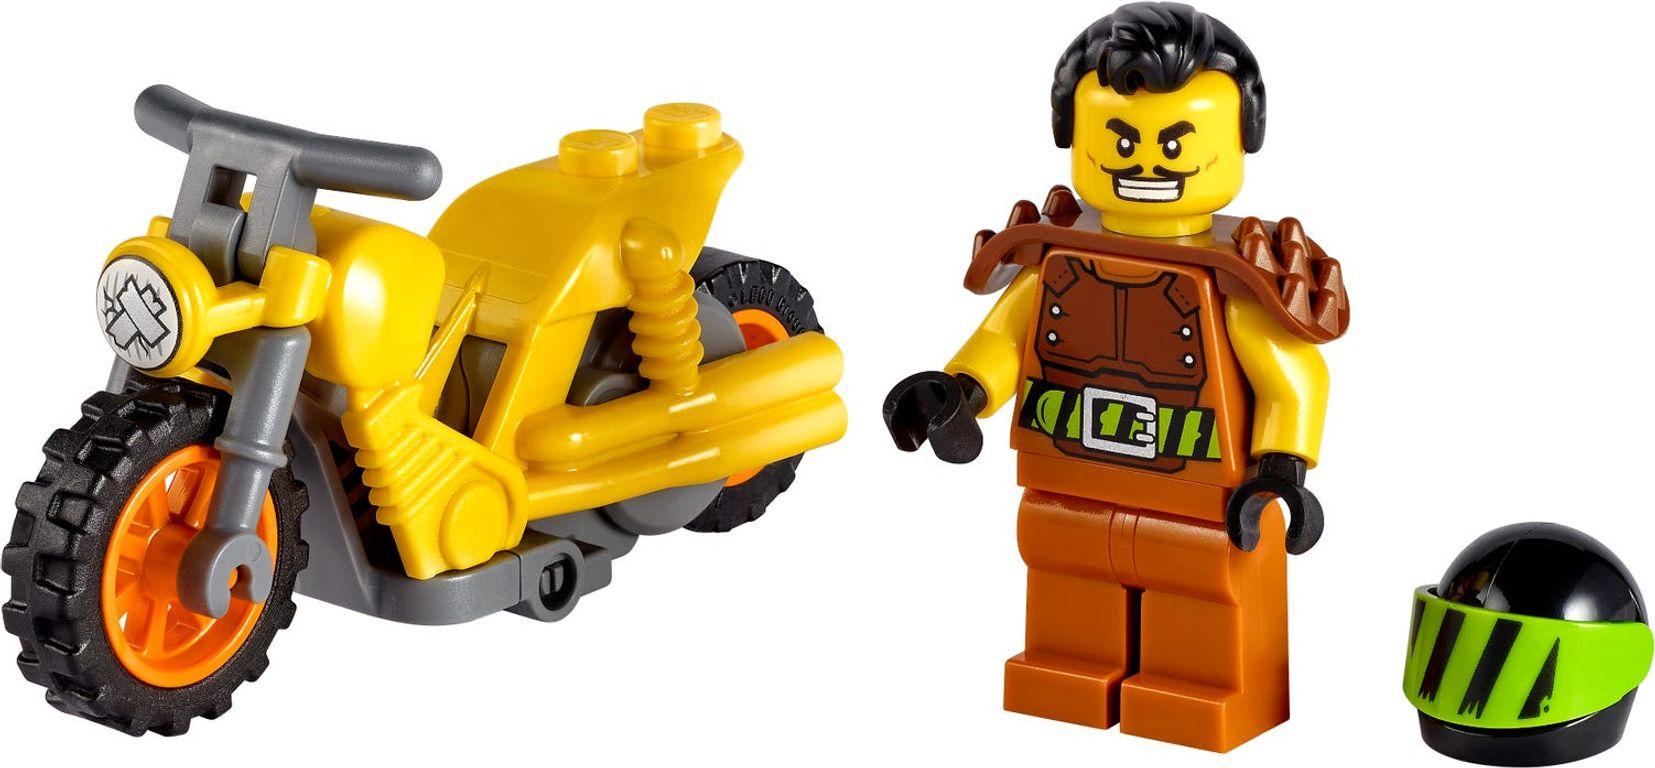 LEGO® City Demolition Stunt Bike components